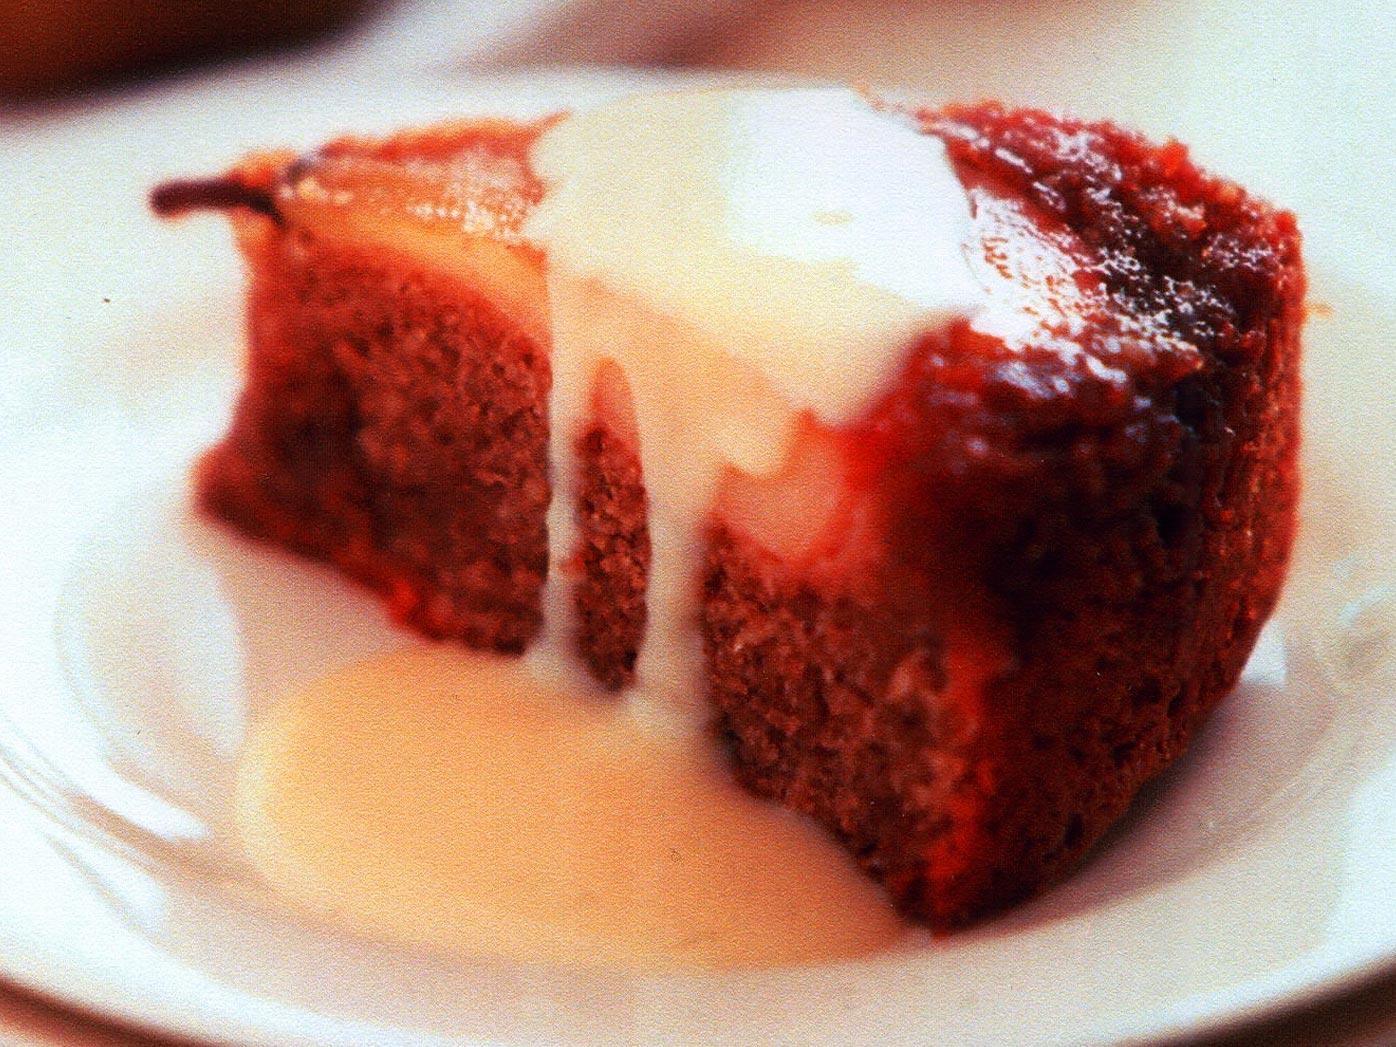 Upside-down pear pudding with vanilla custard